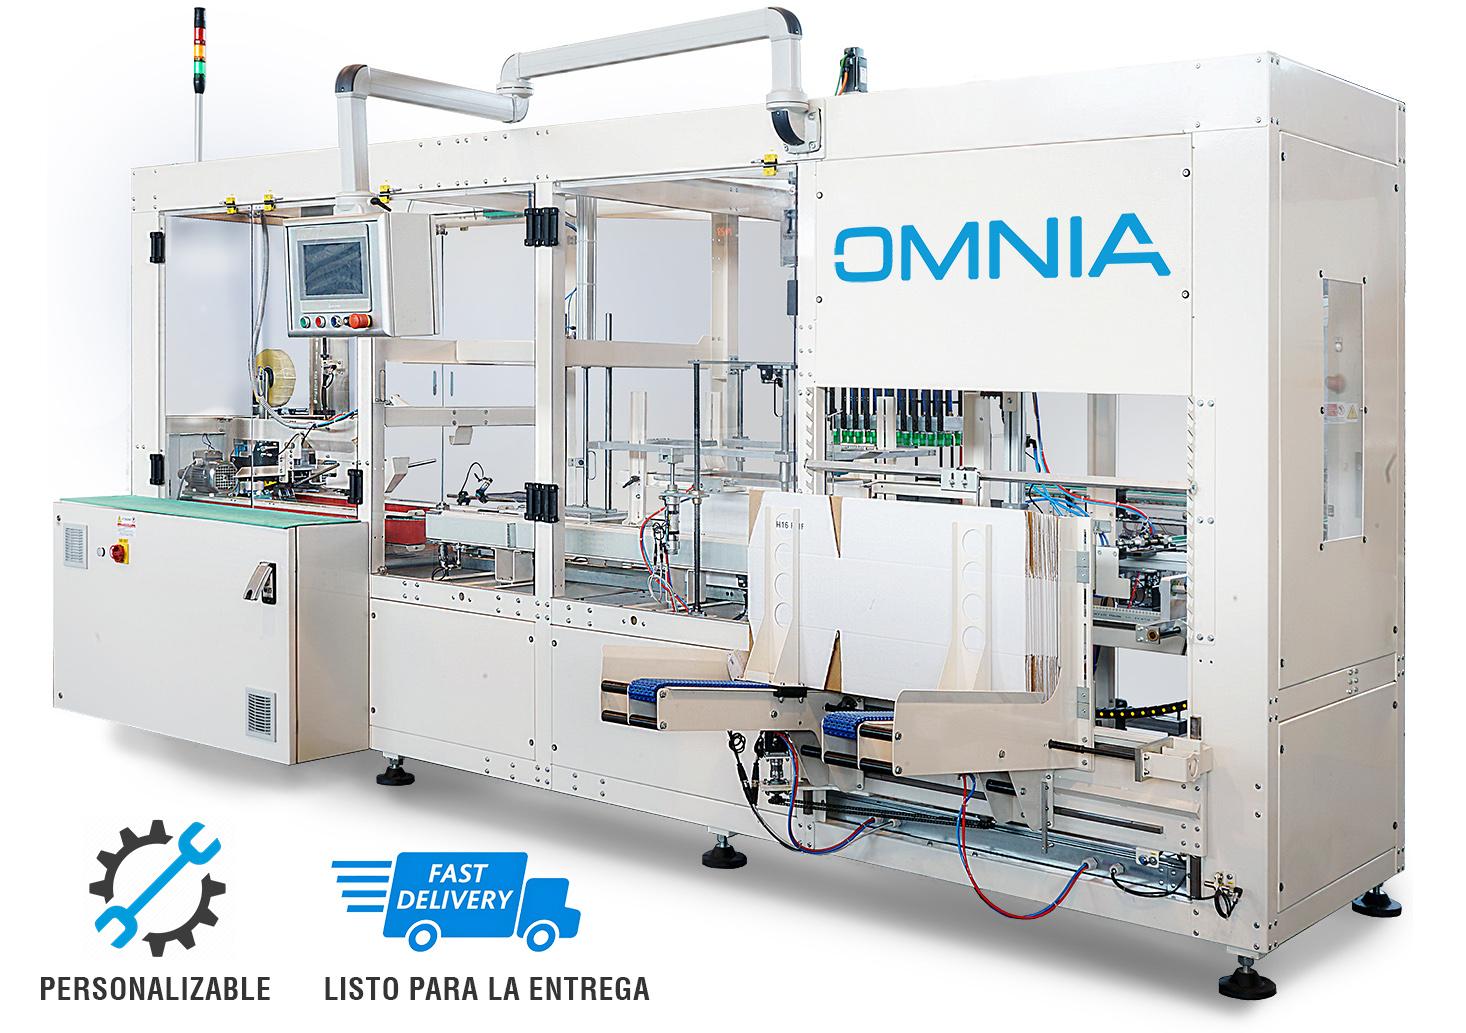 omnia_fast delivery_ESPANHOL_web